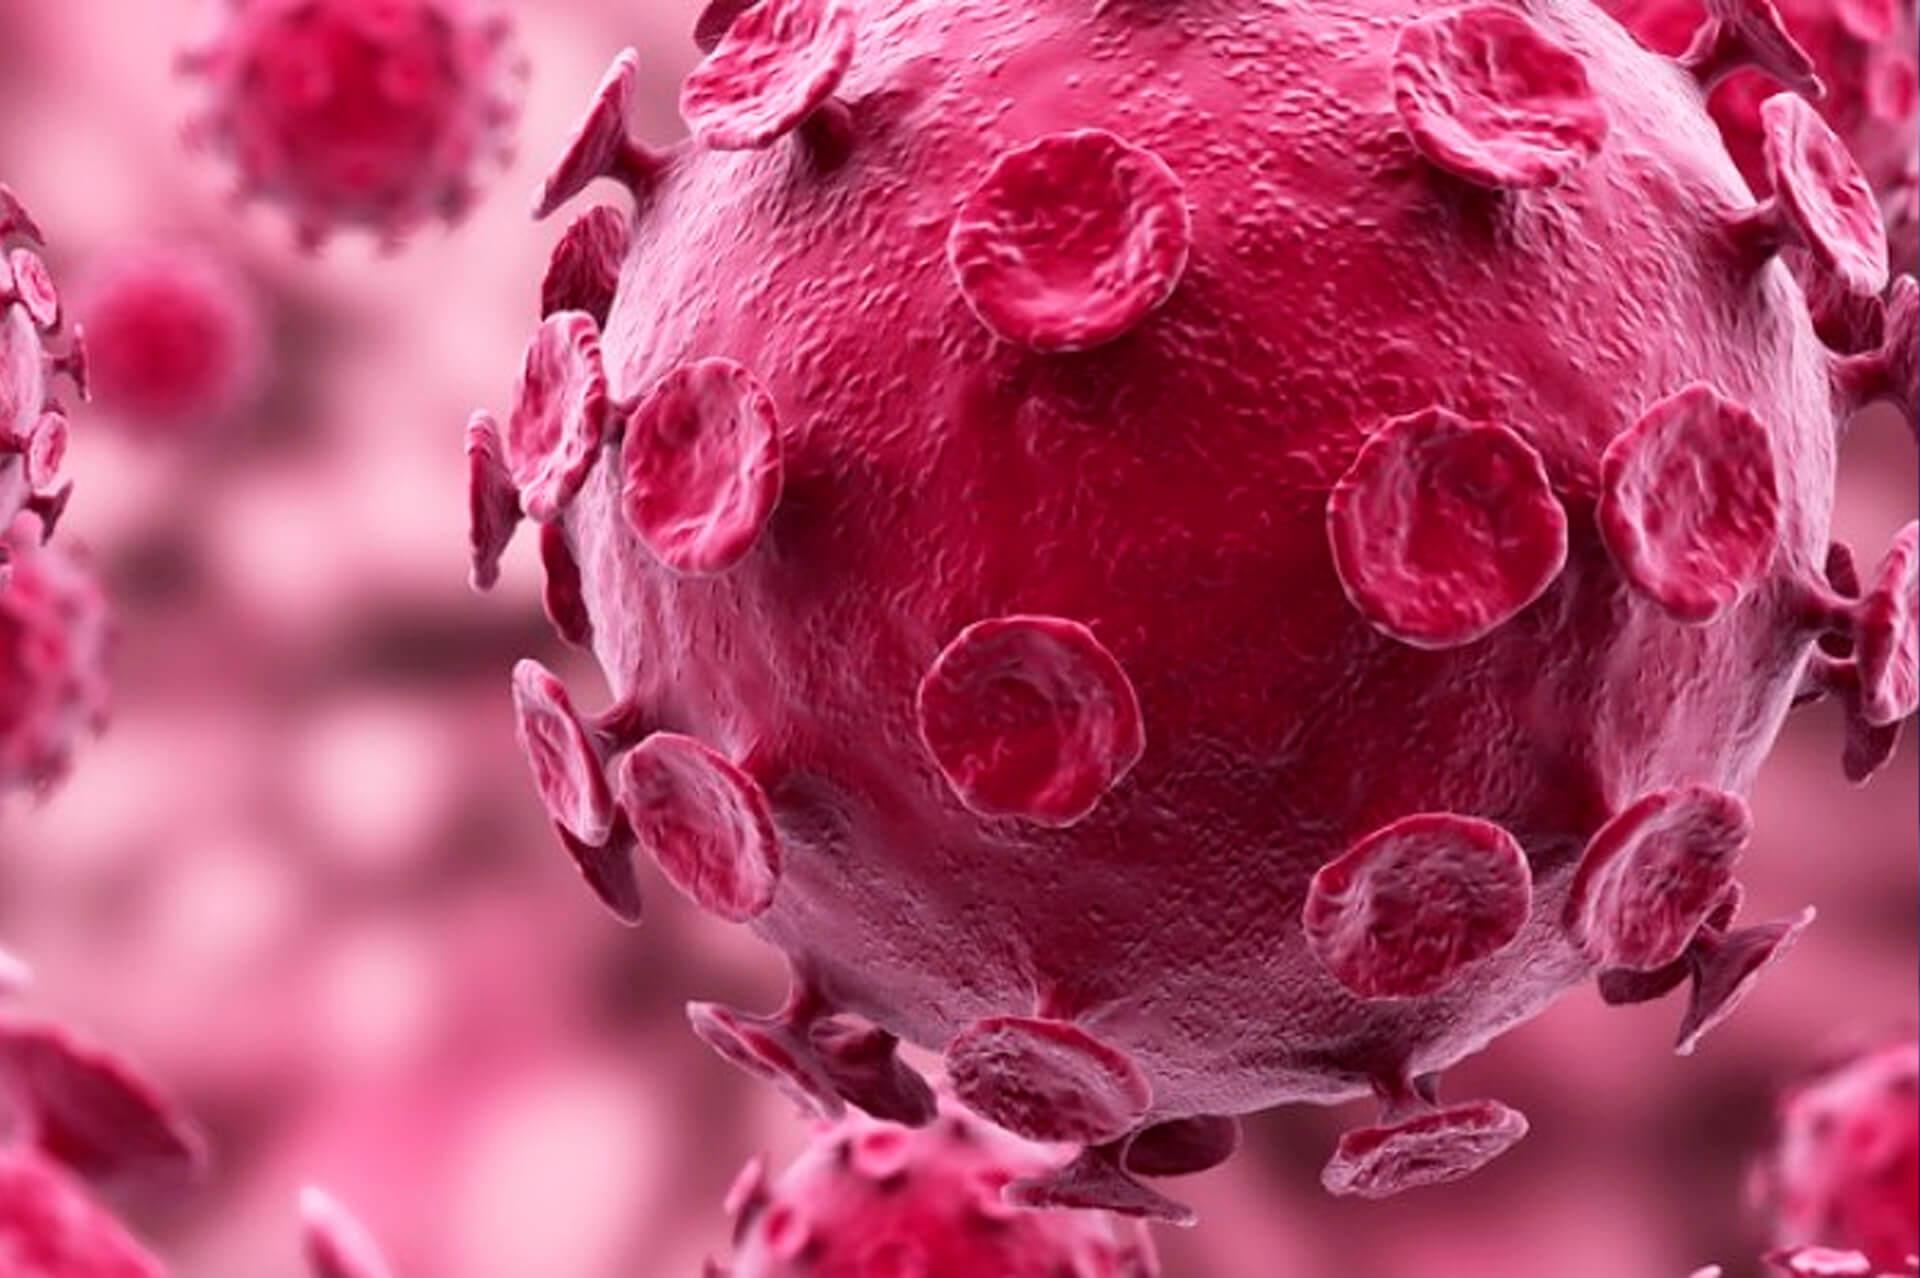 Oncohematología